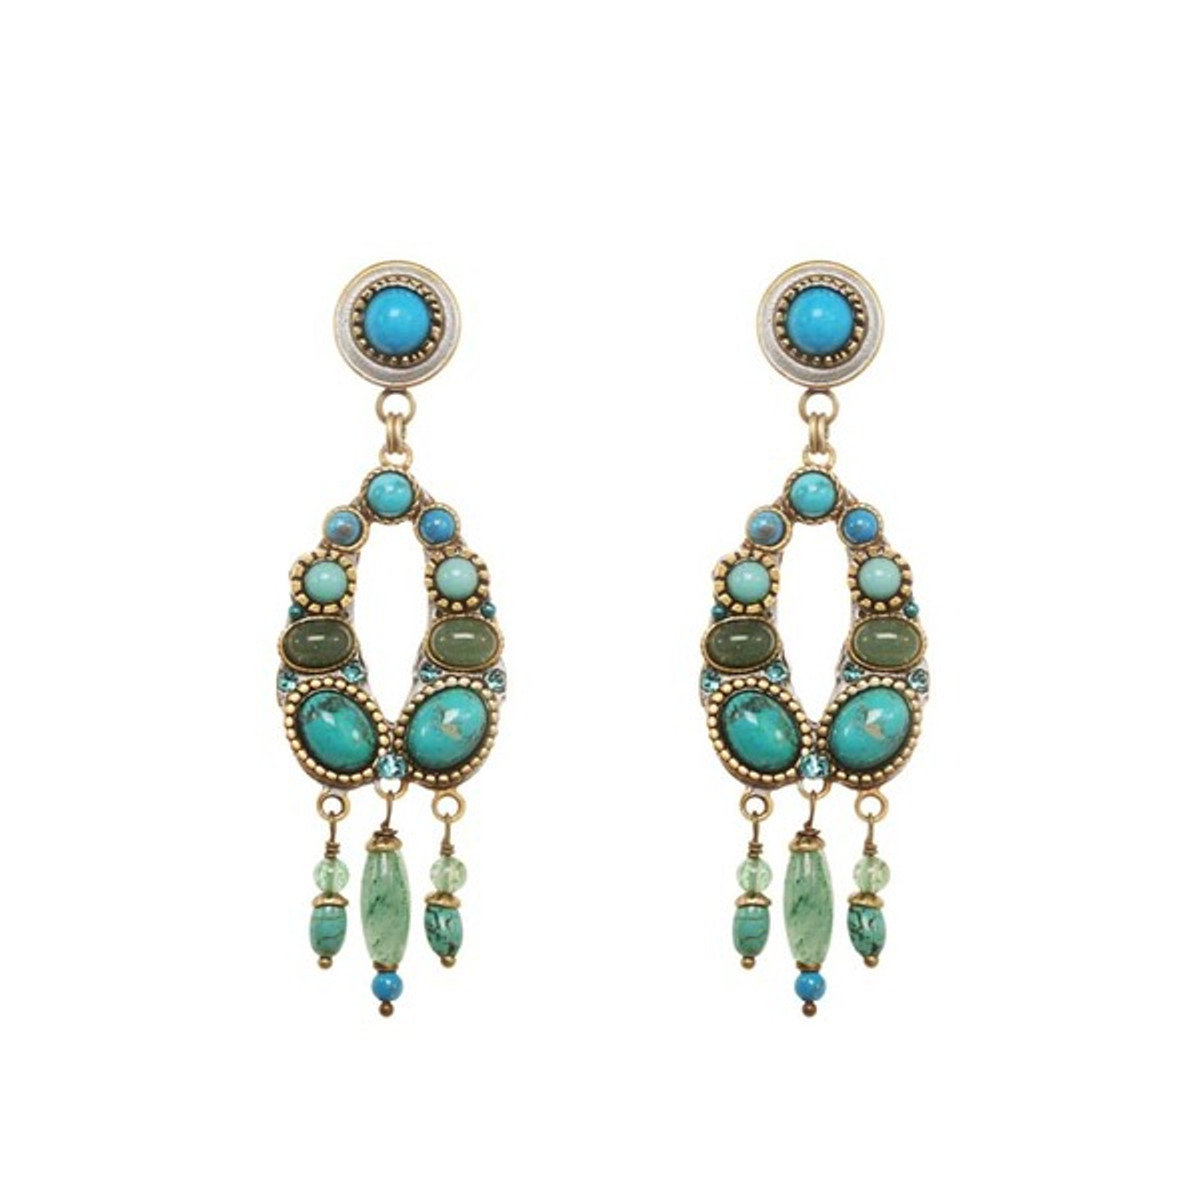 Turquoise Michal Golan - Nile Earrings